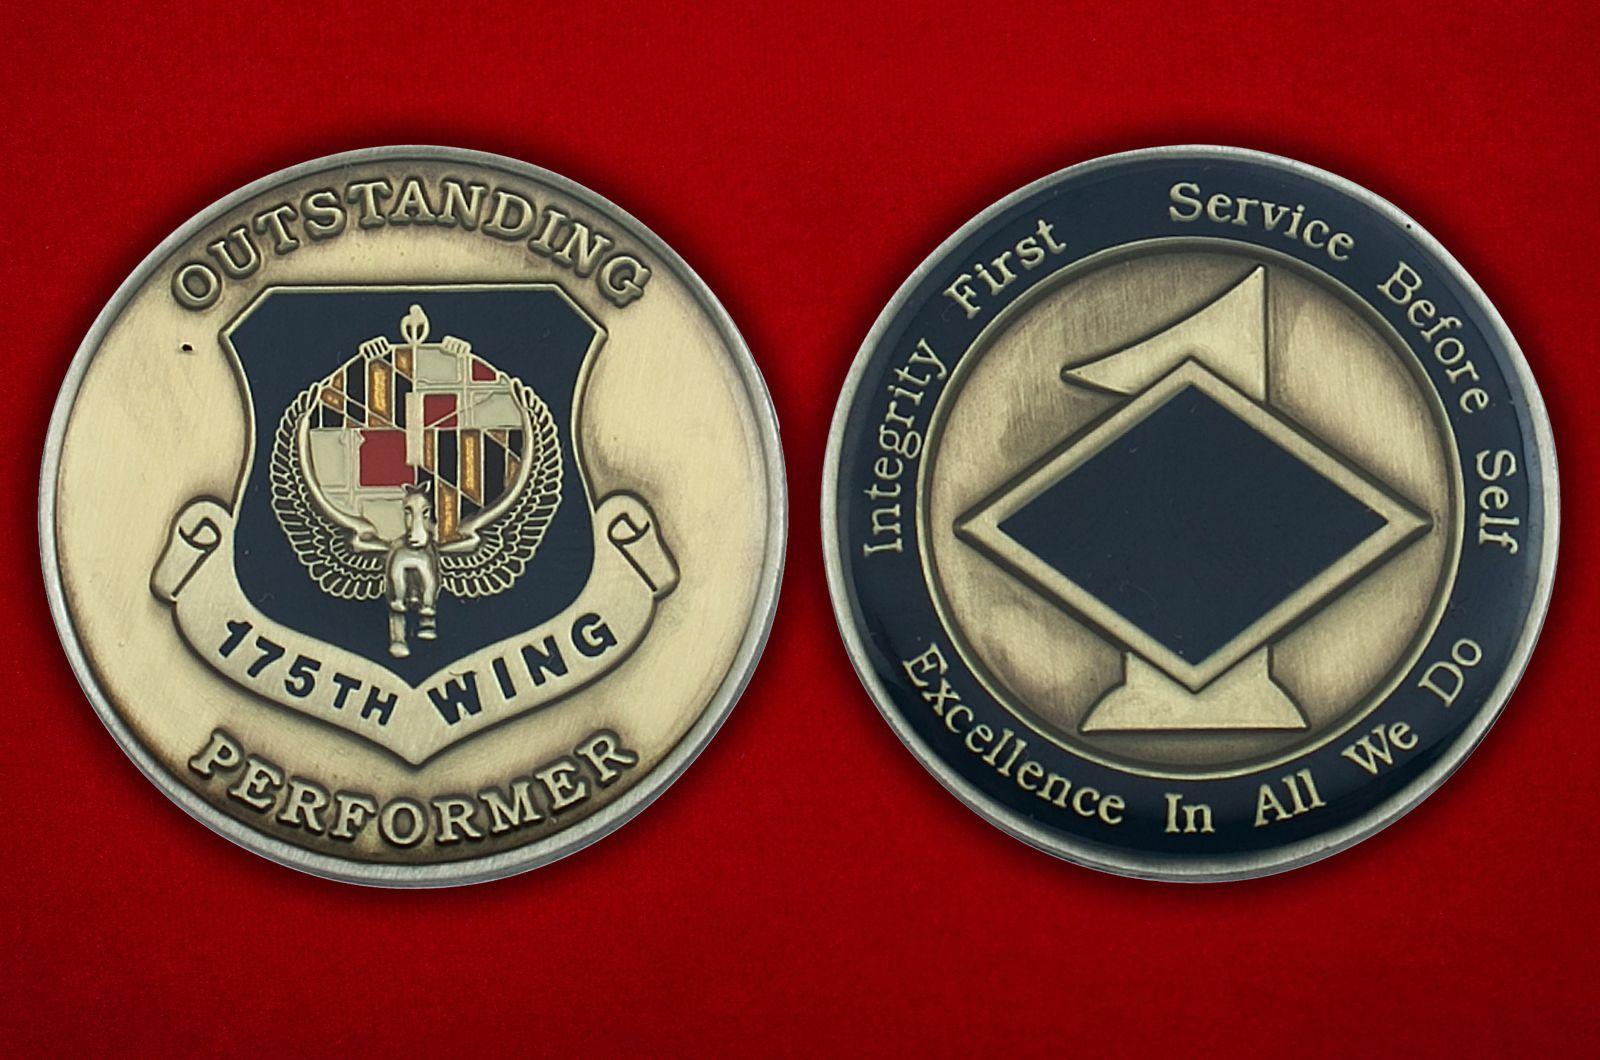 Челлендж коин 175-го авиакрыла ВВС США - аверс и реверс